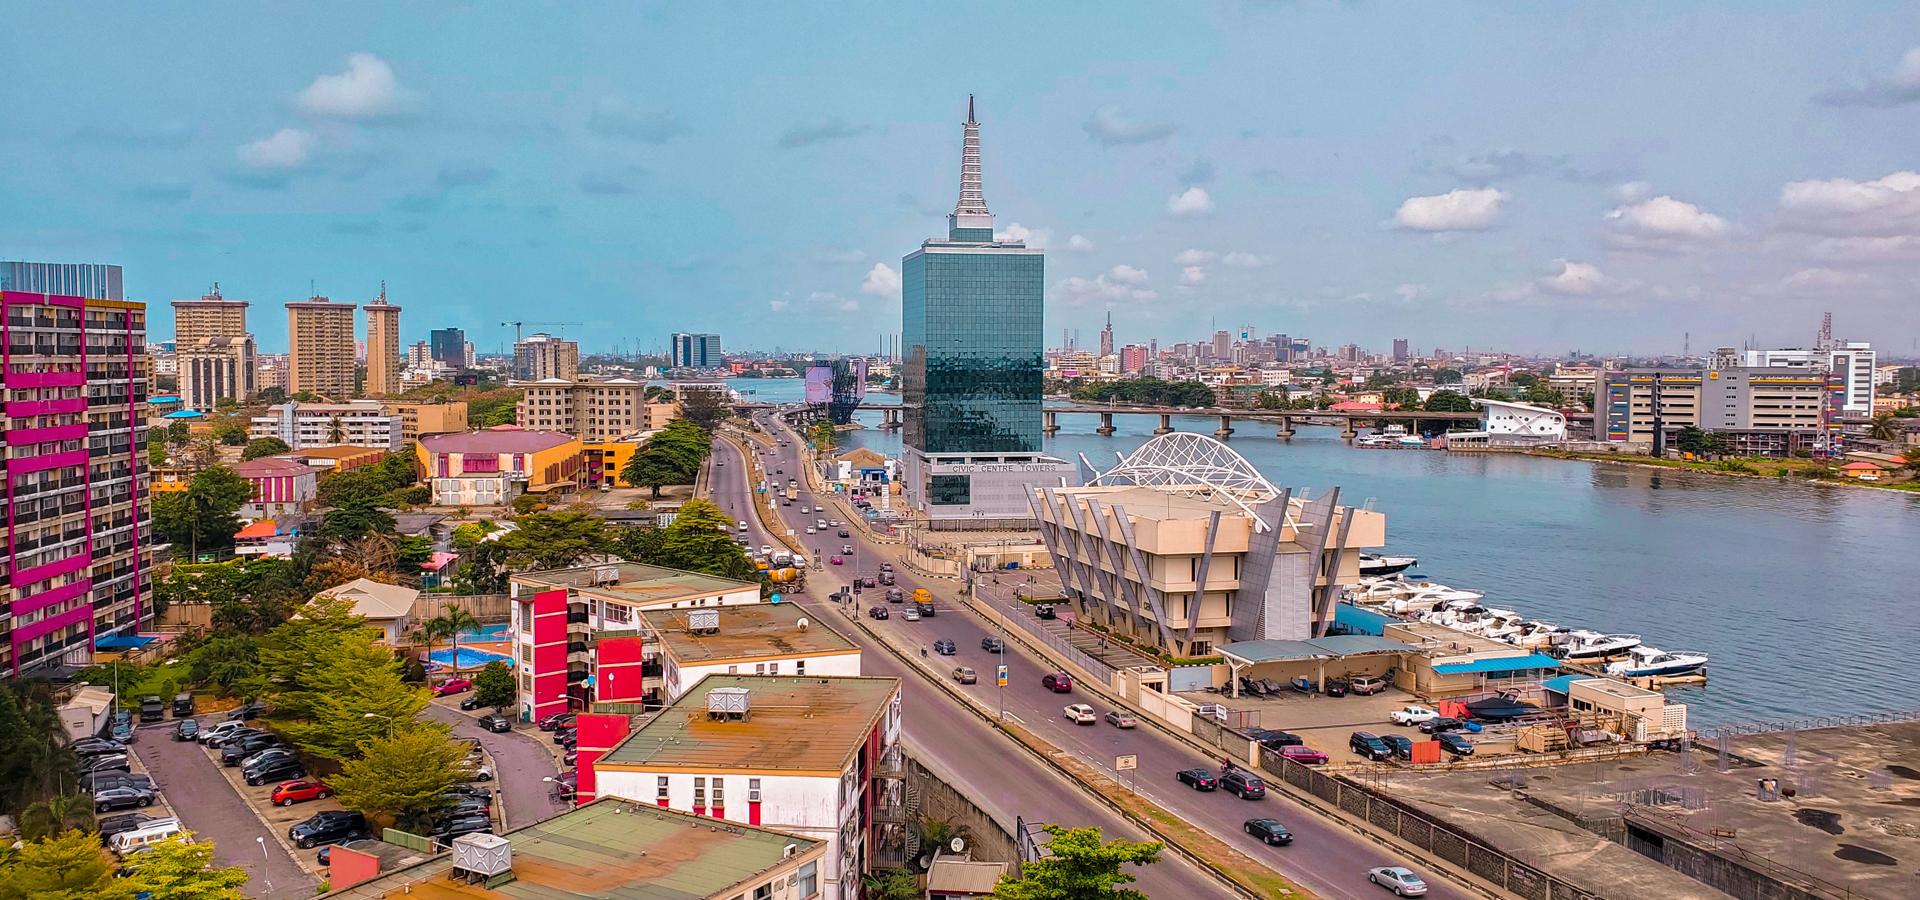 Peer-to-peer advisory in Lagos, Nigeria